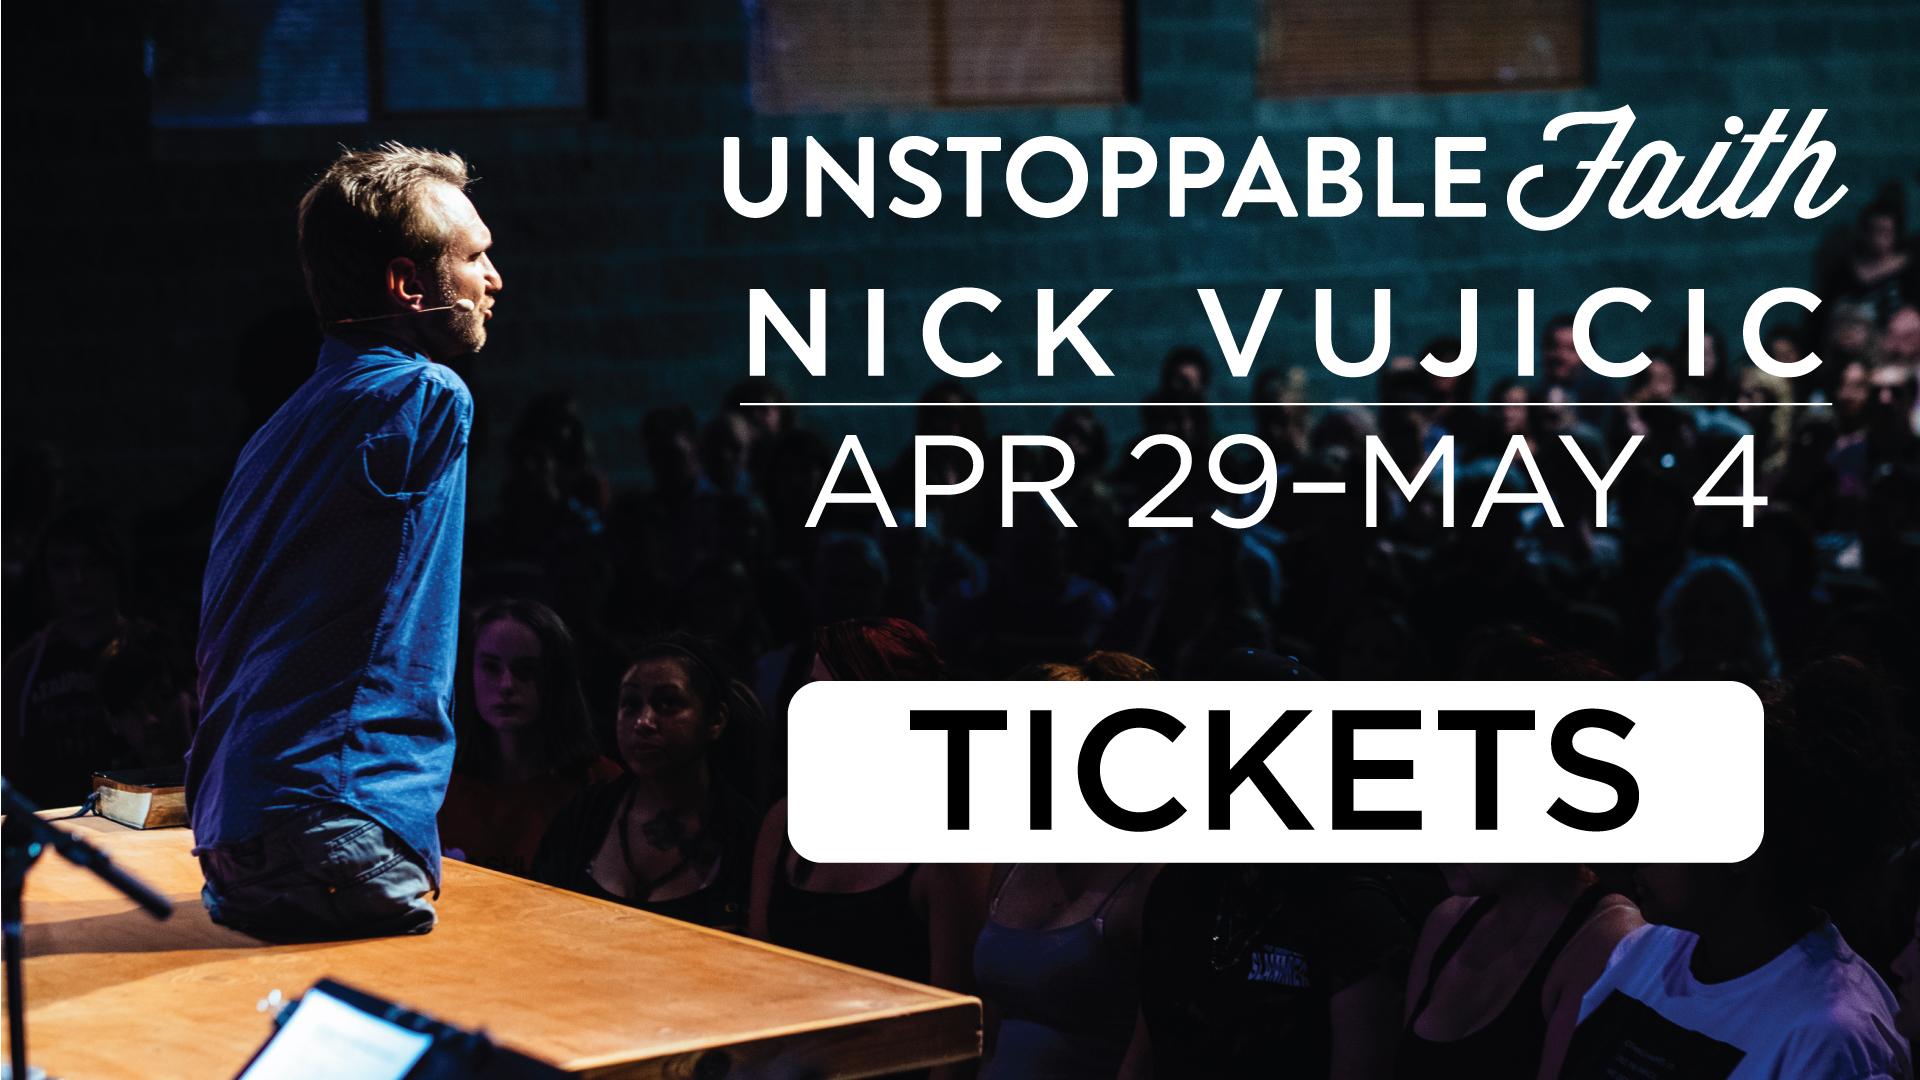 Unstoppable-Faith_Tickets_Website.jpg